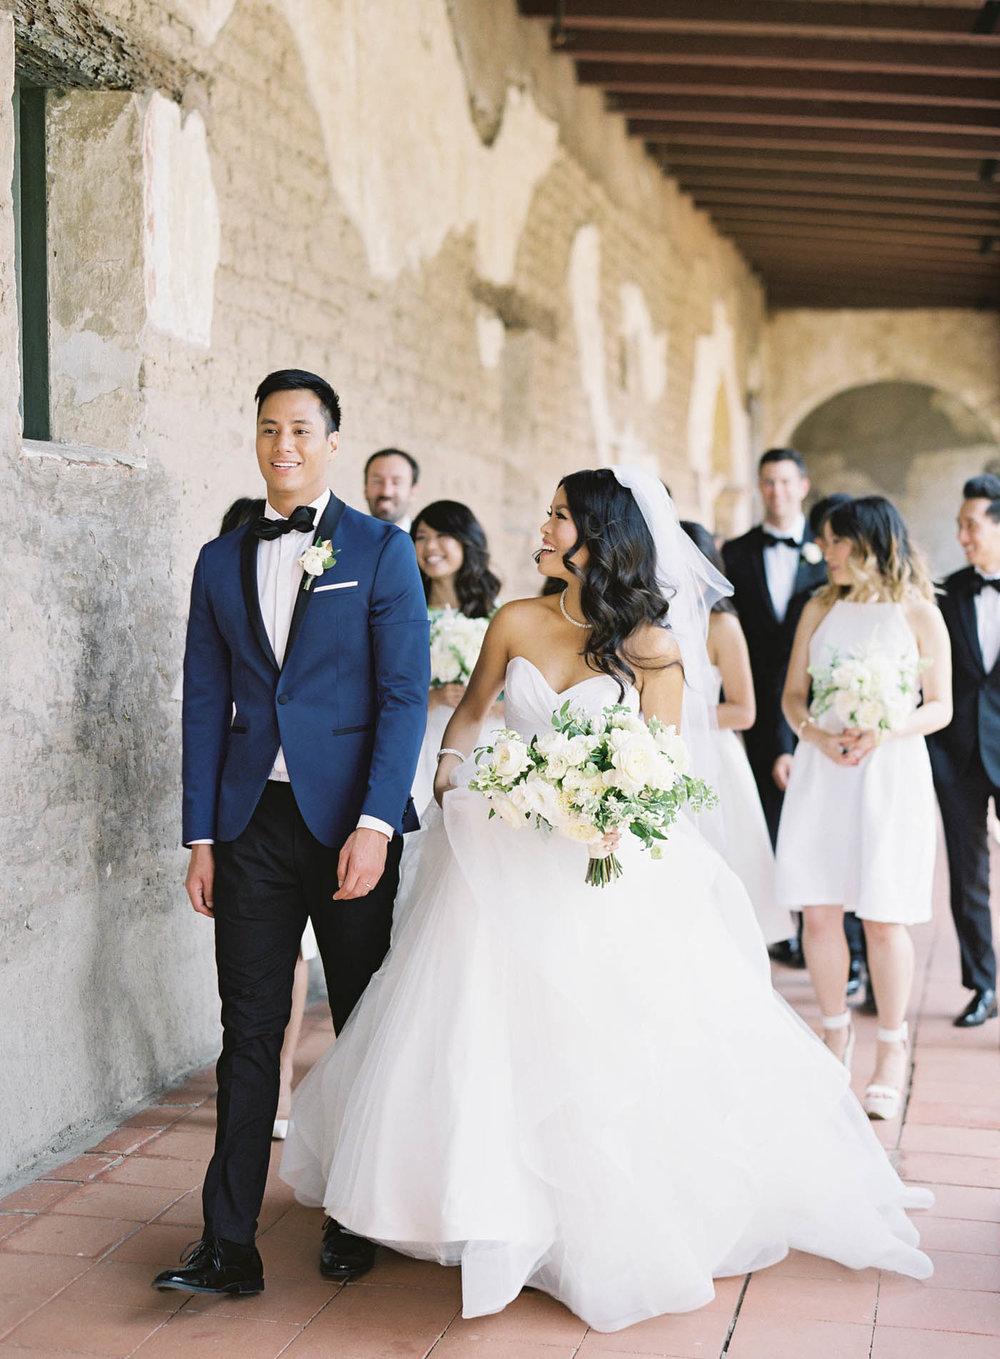 franciscan-gardens-wedding-7-Jen_Huang-000758-R1-012.jpg